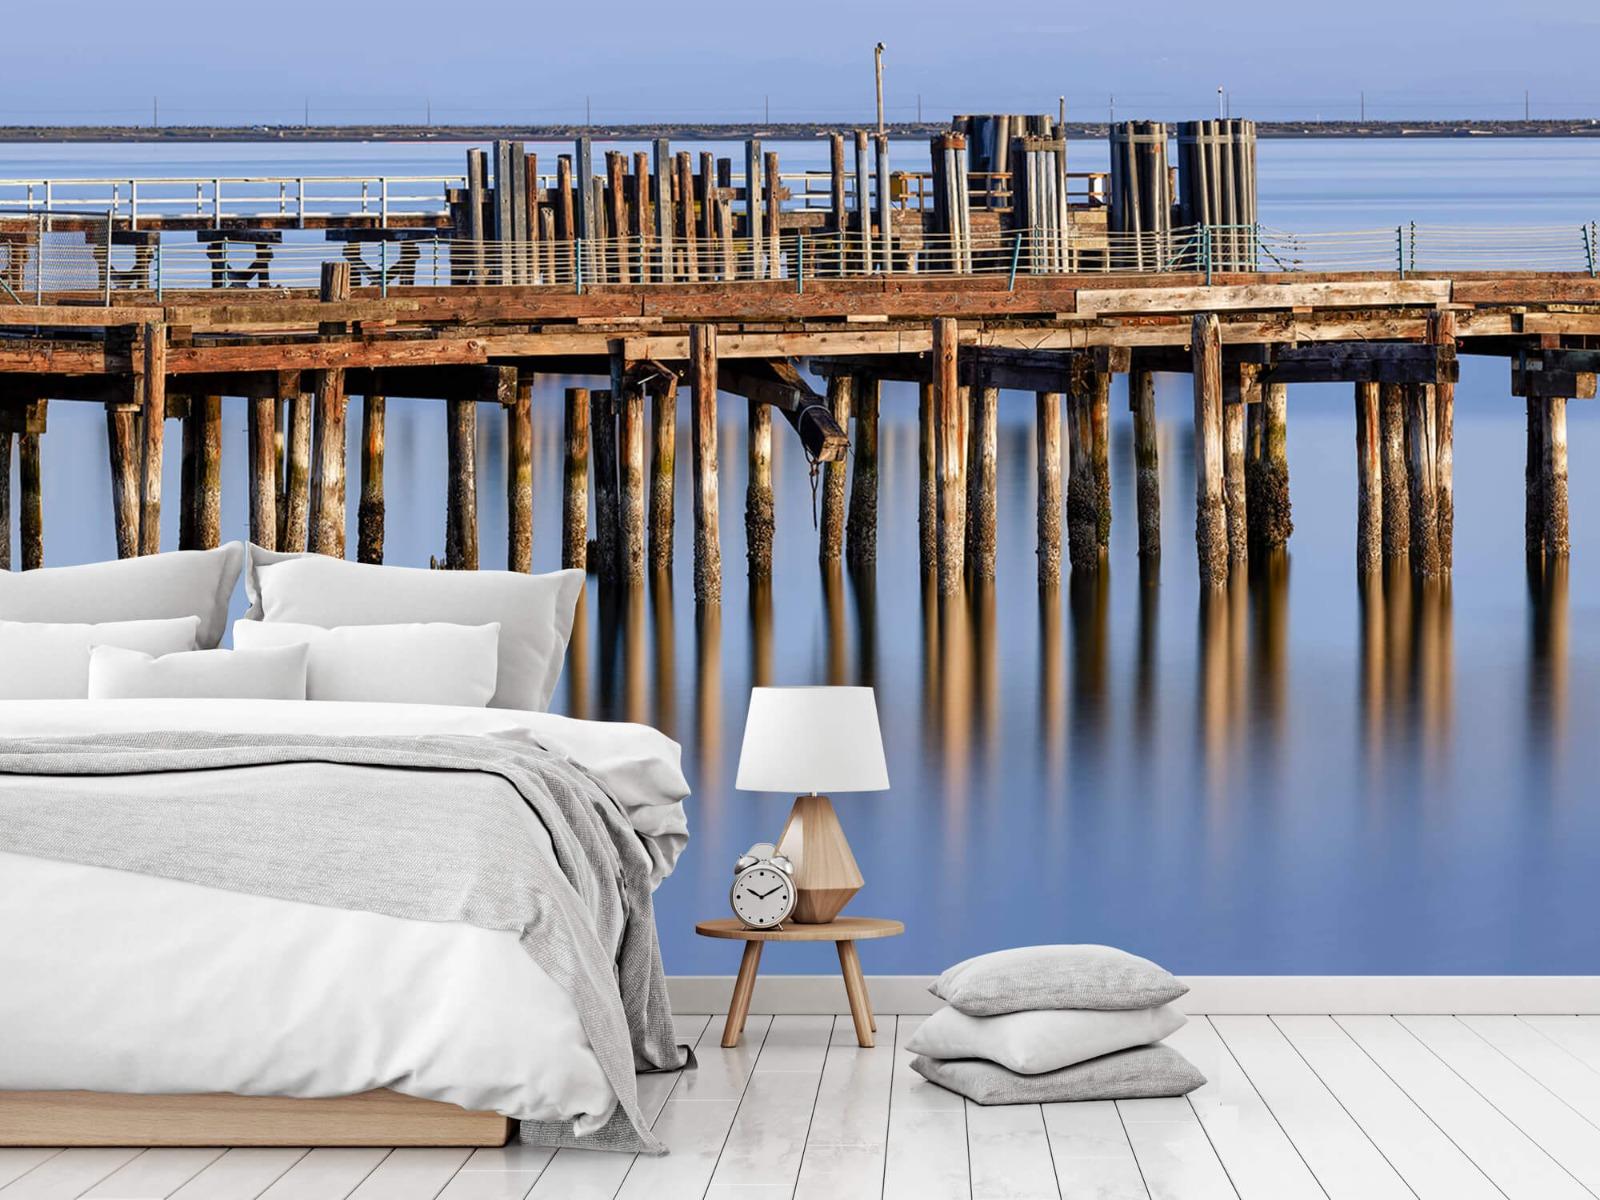 Houten Steigers - Steiger op houten palen - Wallexclusive - Slaapkamer 1